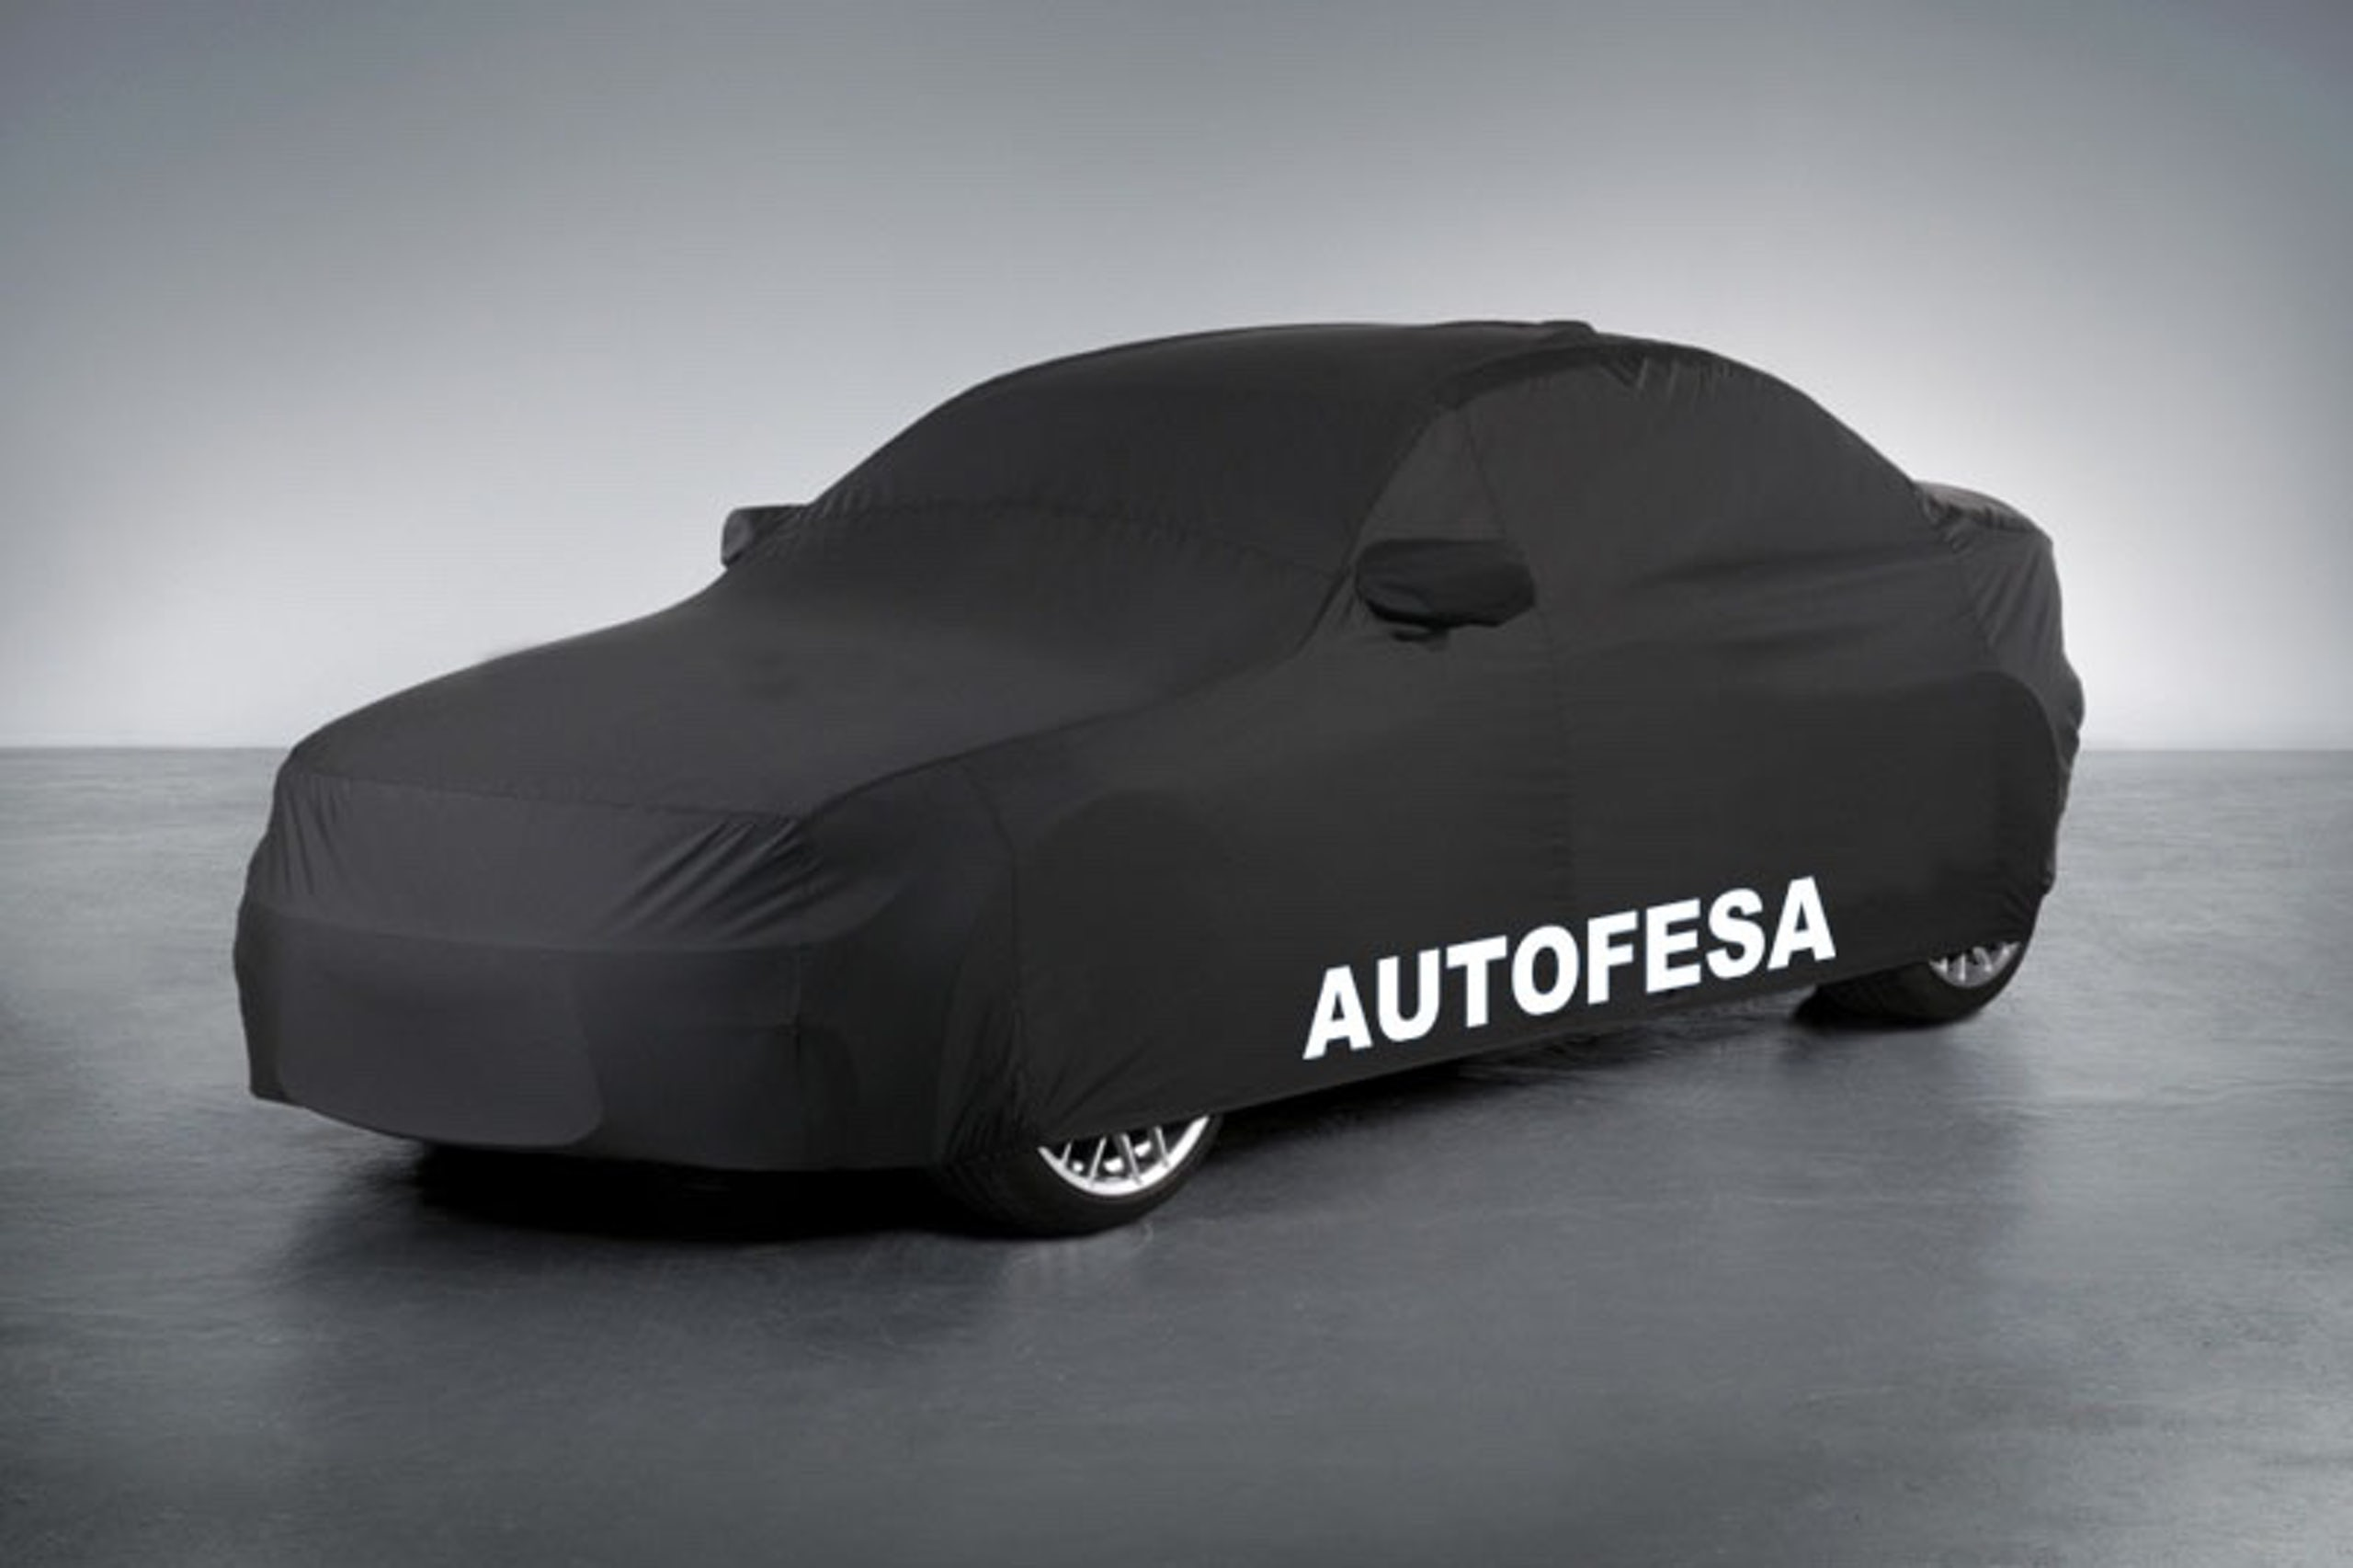 Ford Mondeo 2.0 TDCi 150cv Trend 5p Powershift Auto S/S - Foto 35